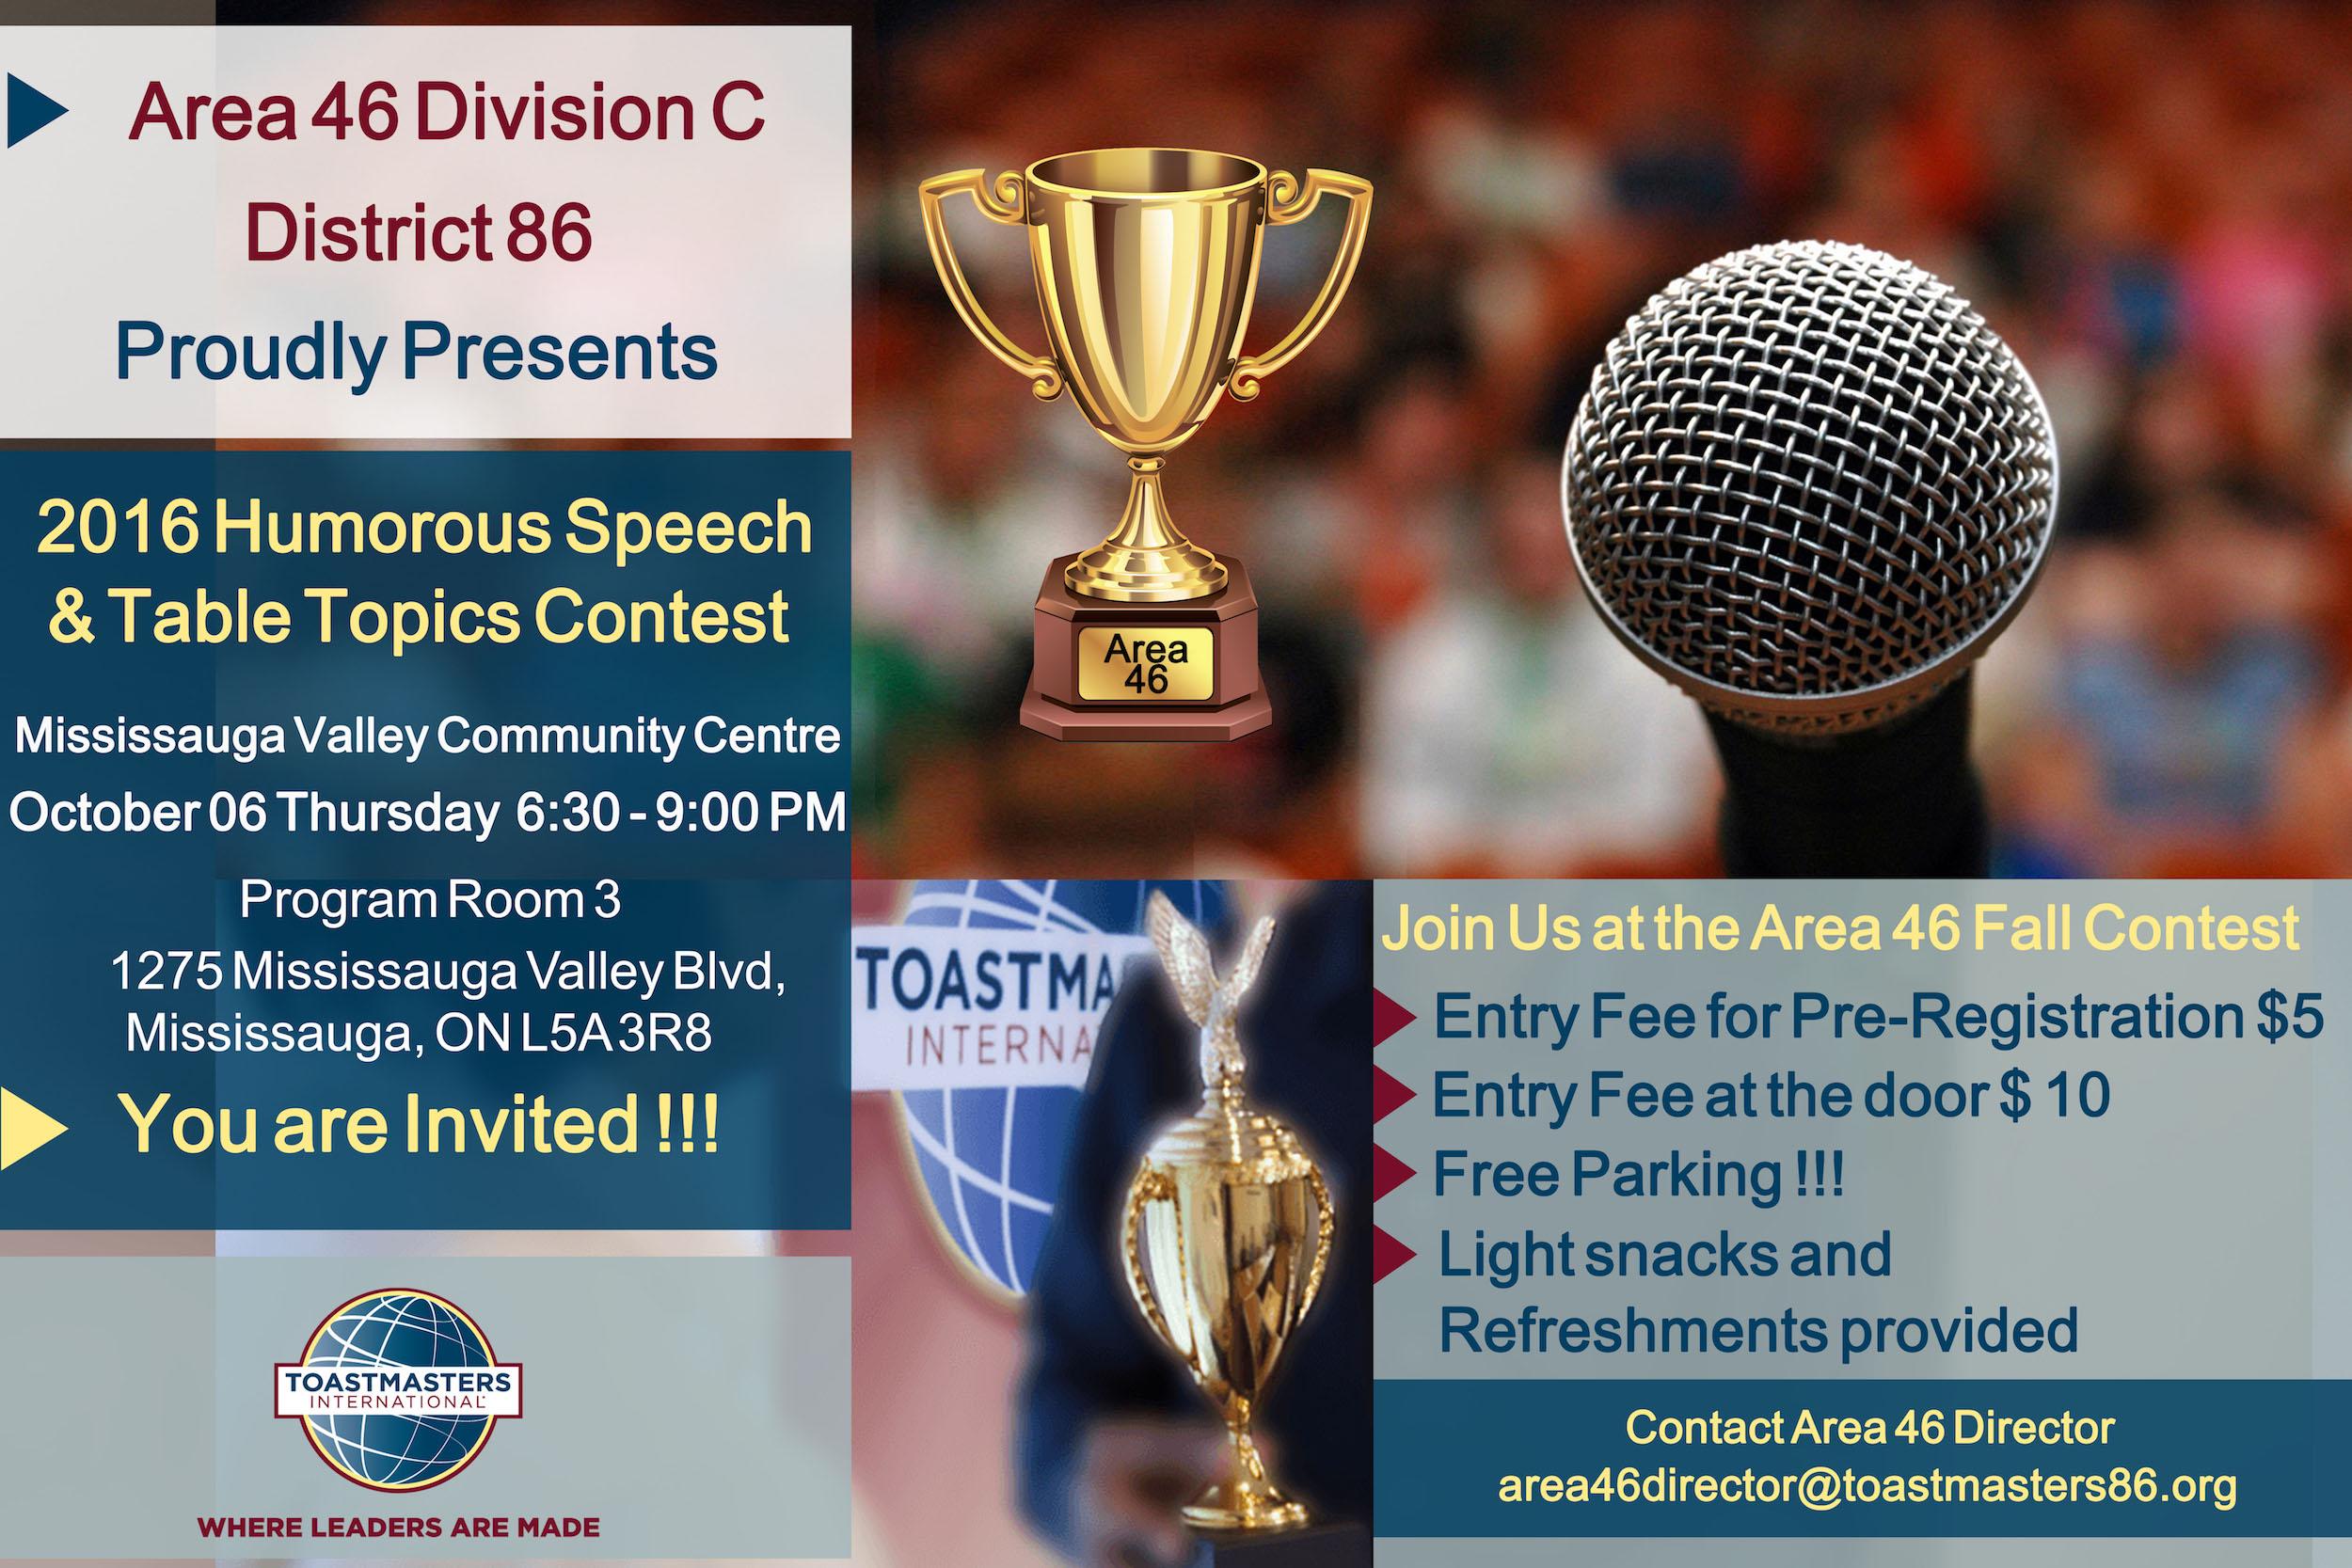 Area 46 Humorous Speech and Table Topics Contest